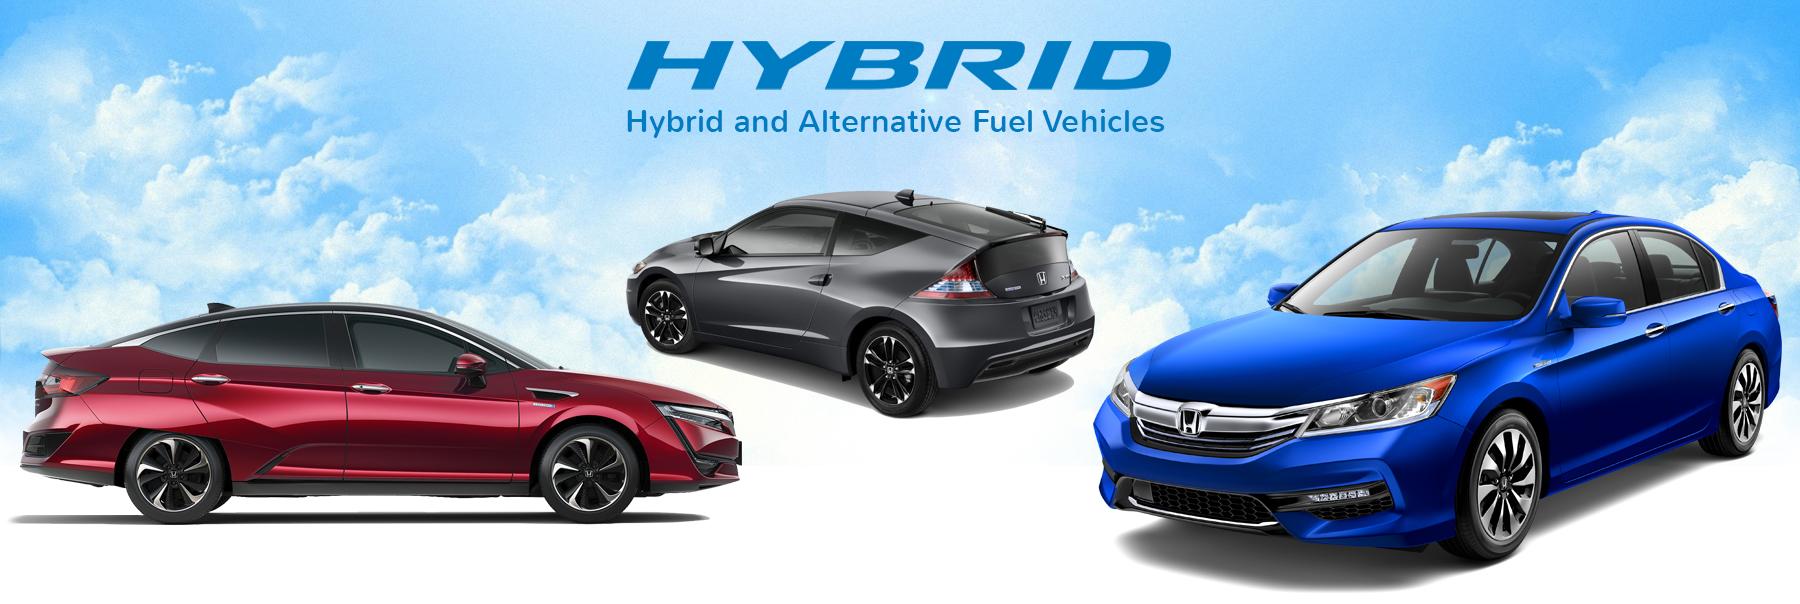 Honda Hybrid and Alternative Fuel Vehicles